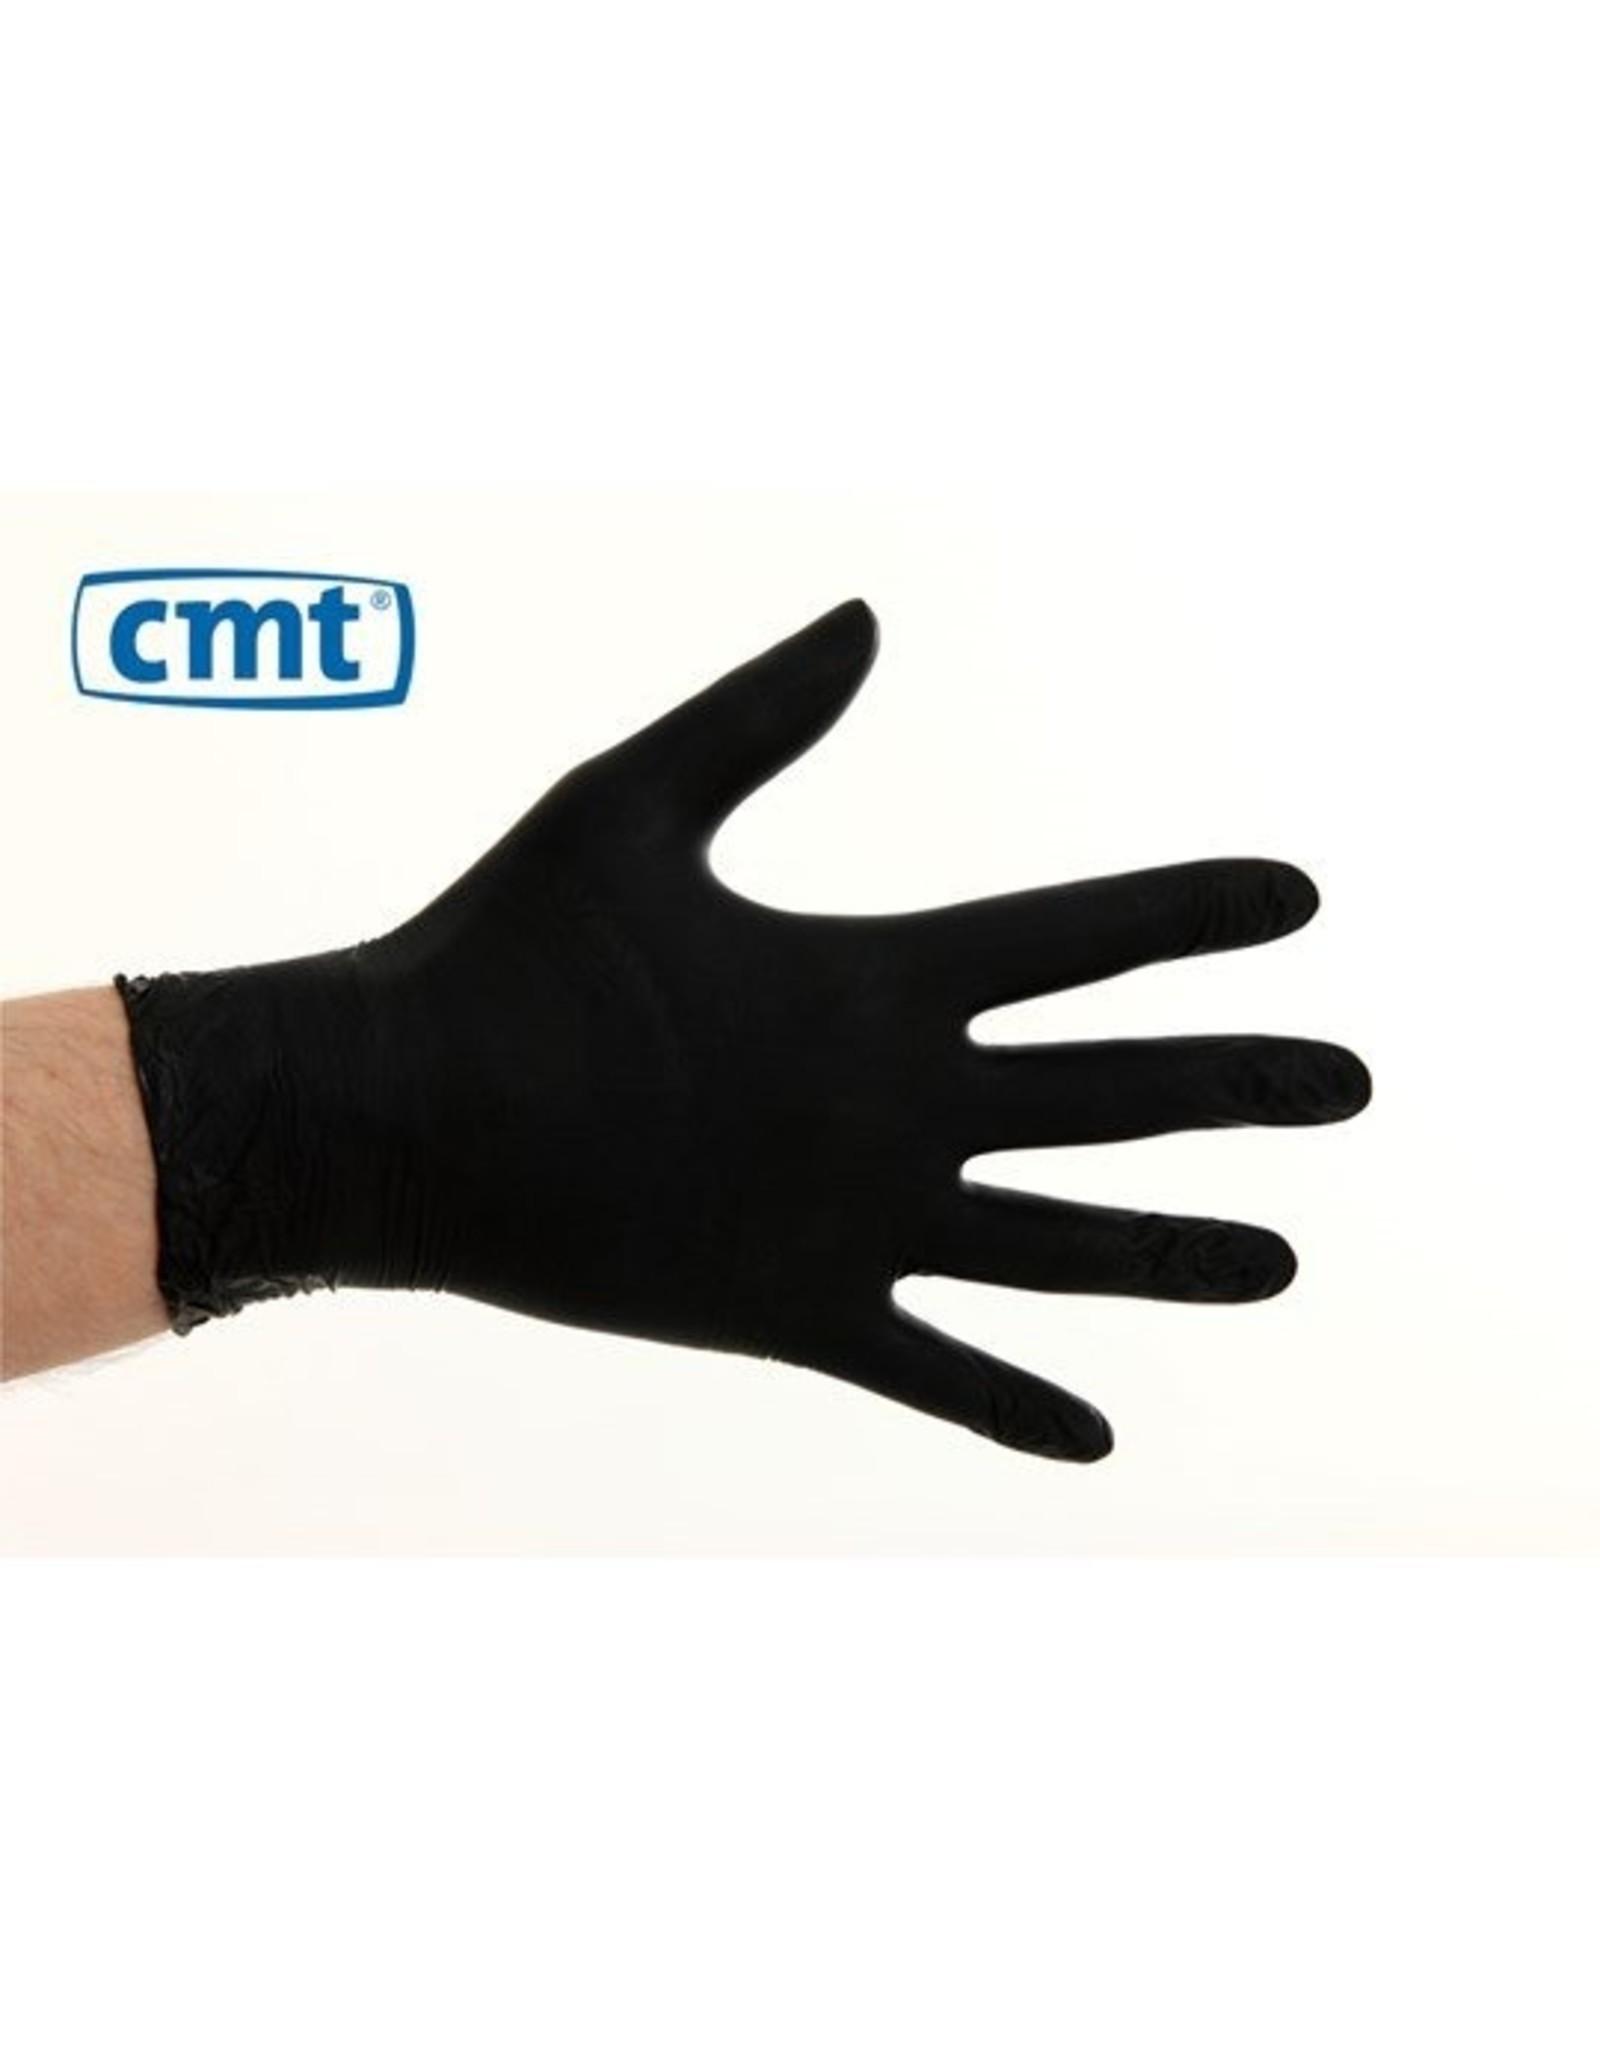 CMT CMT soft nitril handschoenen poedervrij S zwart